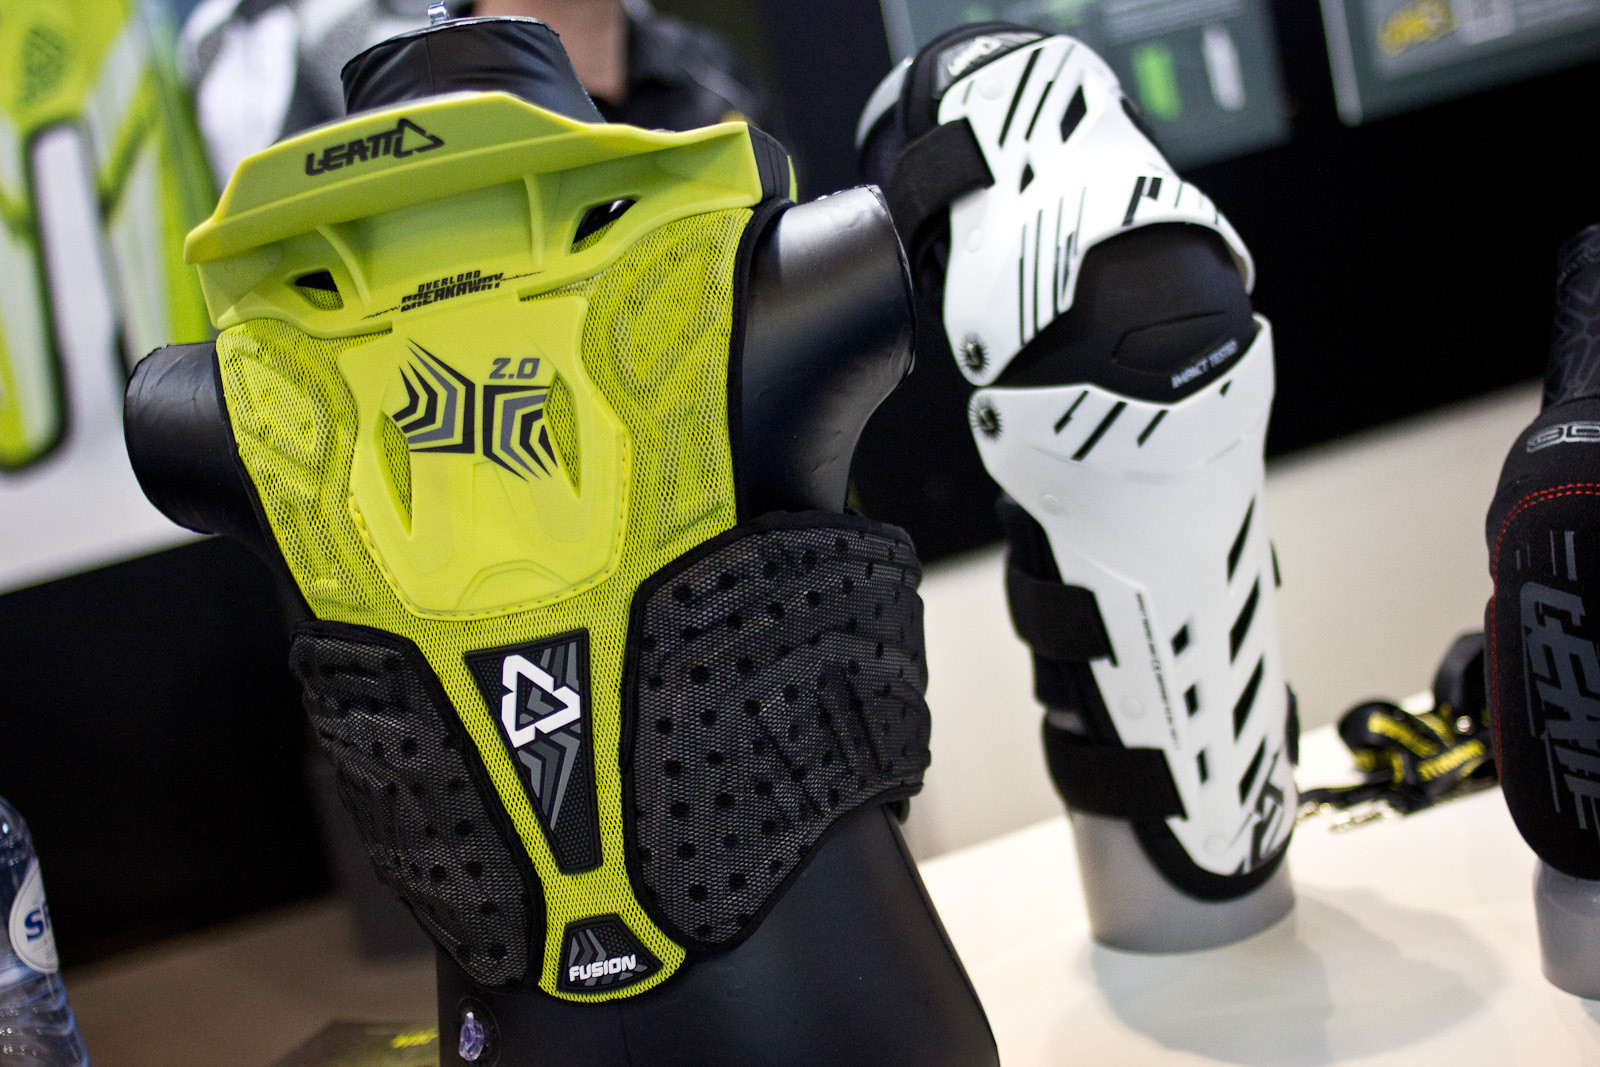 Leatt Fuzion 2.0 Kid's Brace and Armor  - 2014 Mountain Bike Apparel & Protection at Eurobike 2013 - Mountain Biking Pictures - Vital MTB